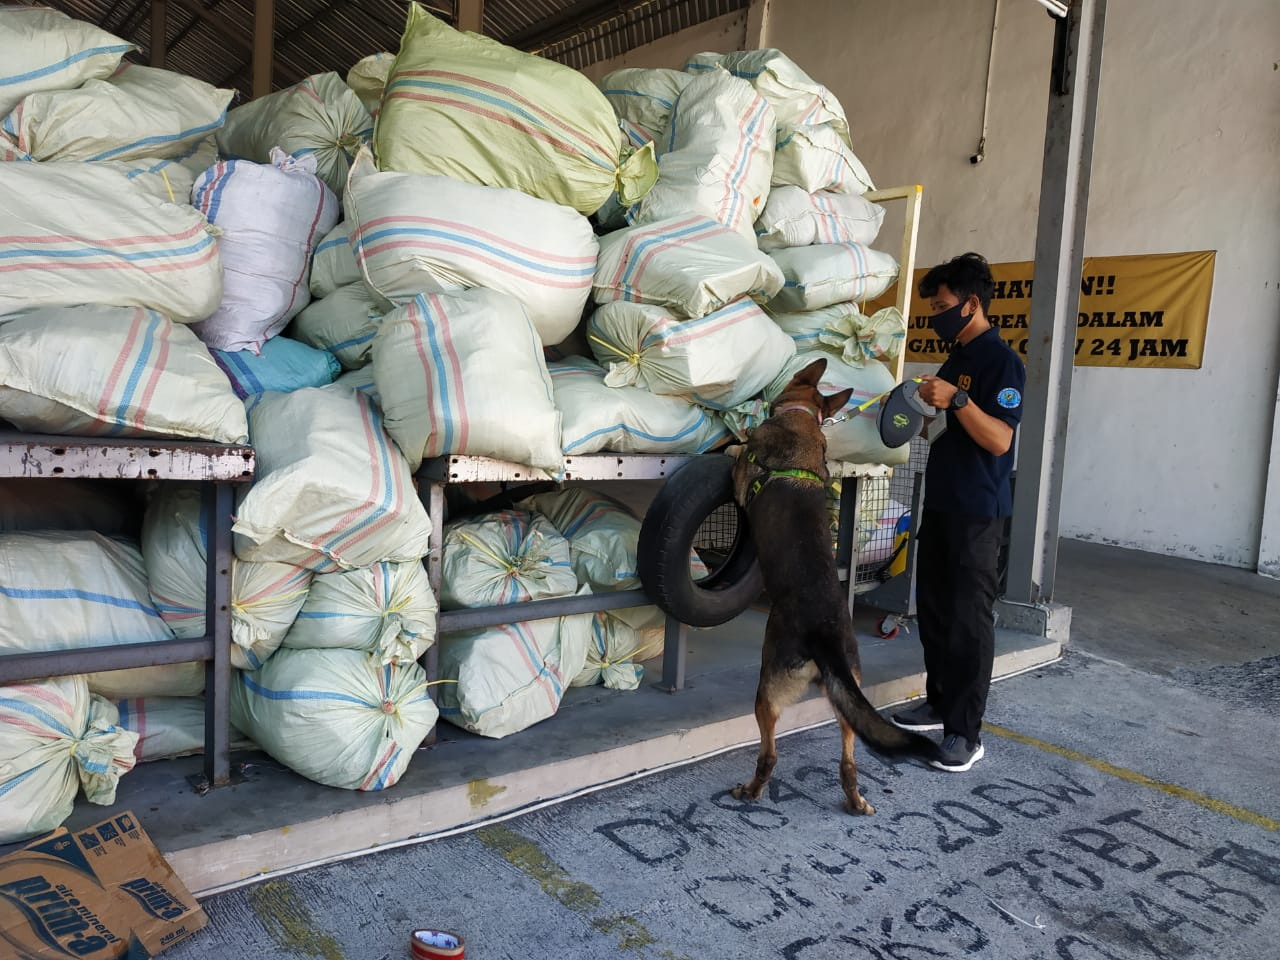 Pelacakan Narkotika di Perusahaan Jasa Titipan (PJT) Swasta